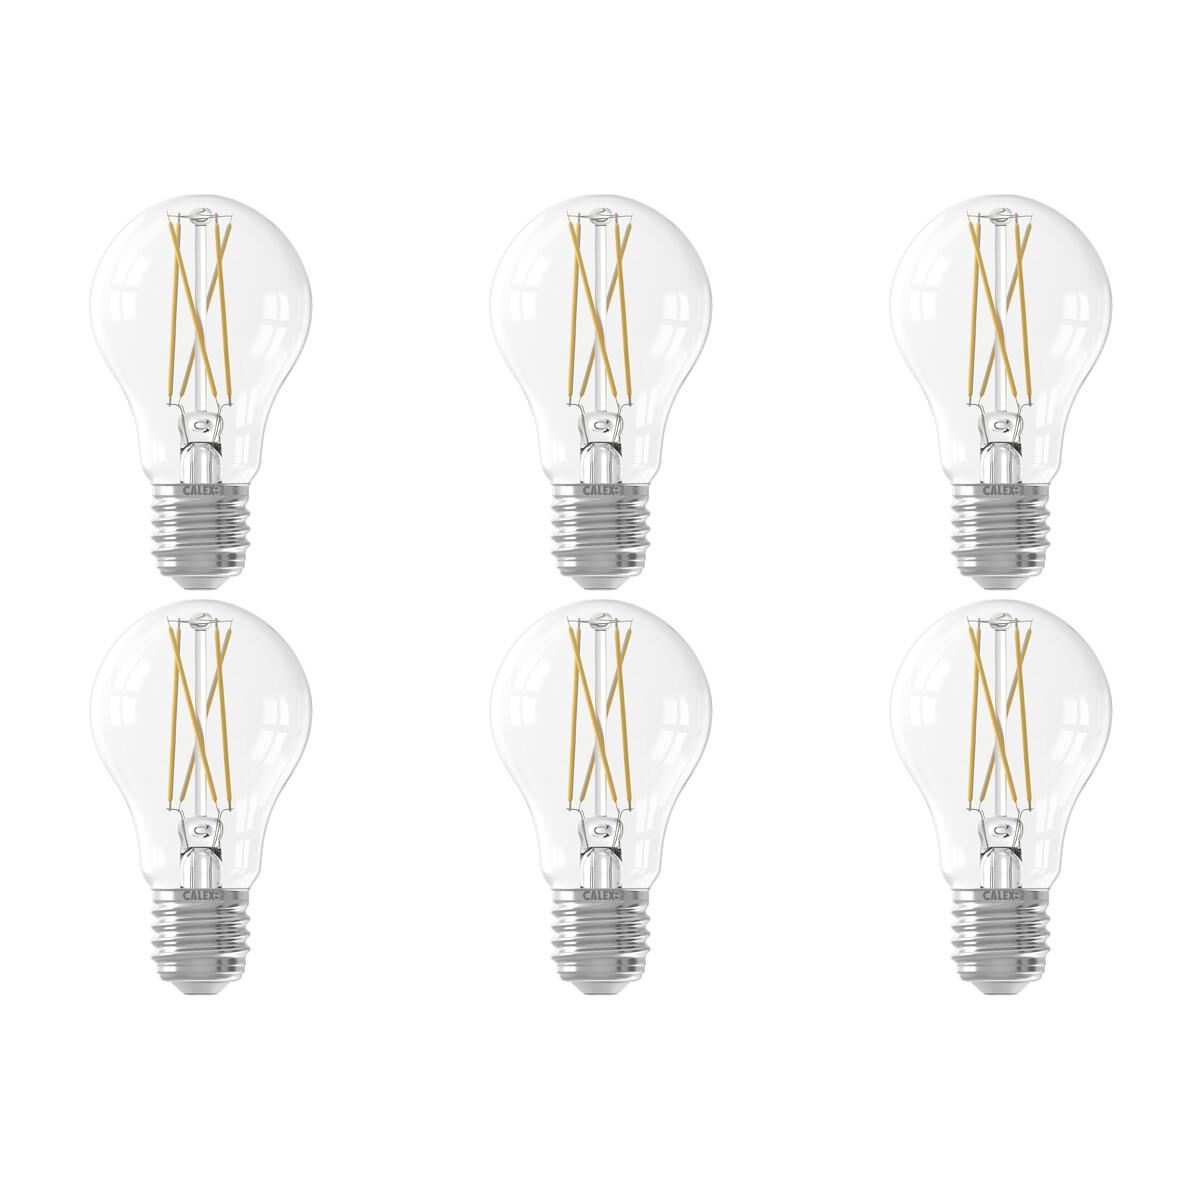 CALEX - LED Lamp 6 Pack - Smart LED A60 - E27 Fitting - Dimbaar - 7W - Aanpasbare Kleur CCT - Transp